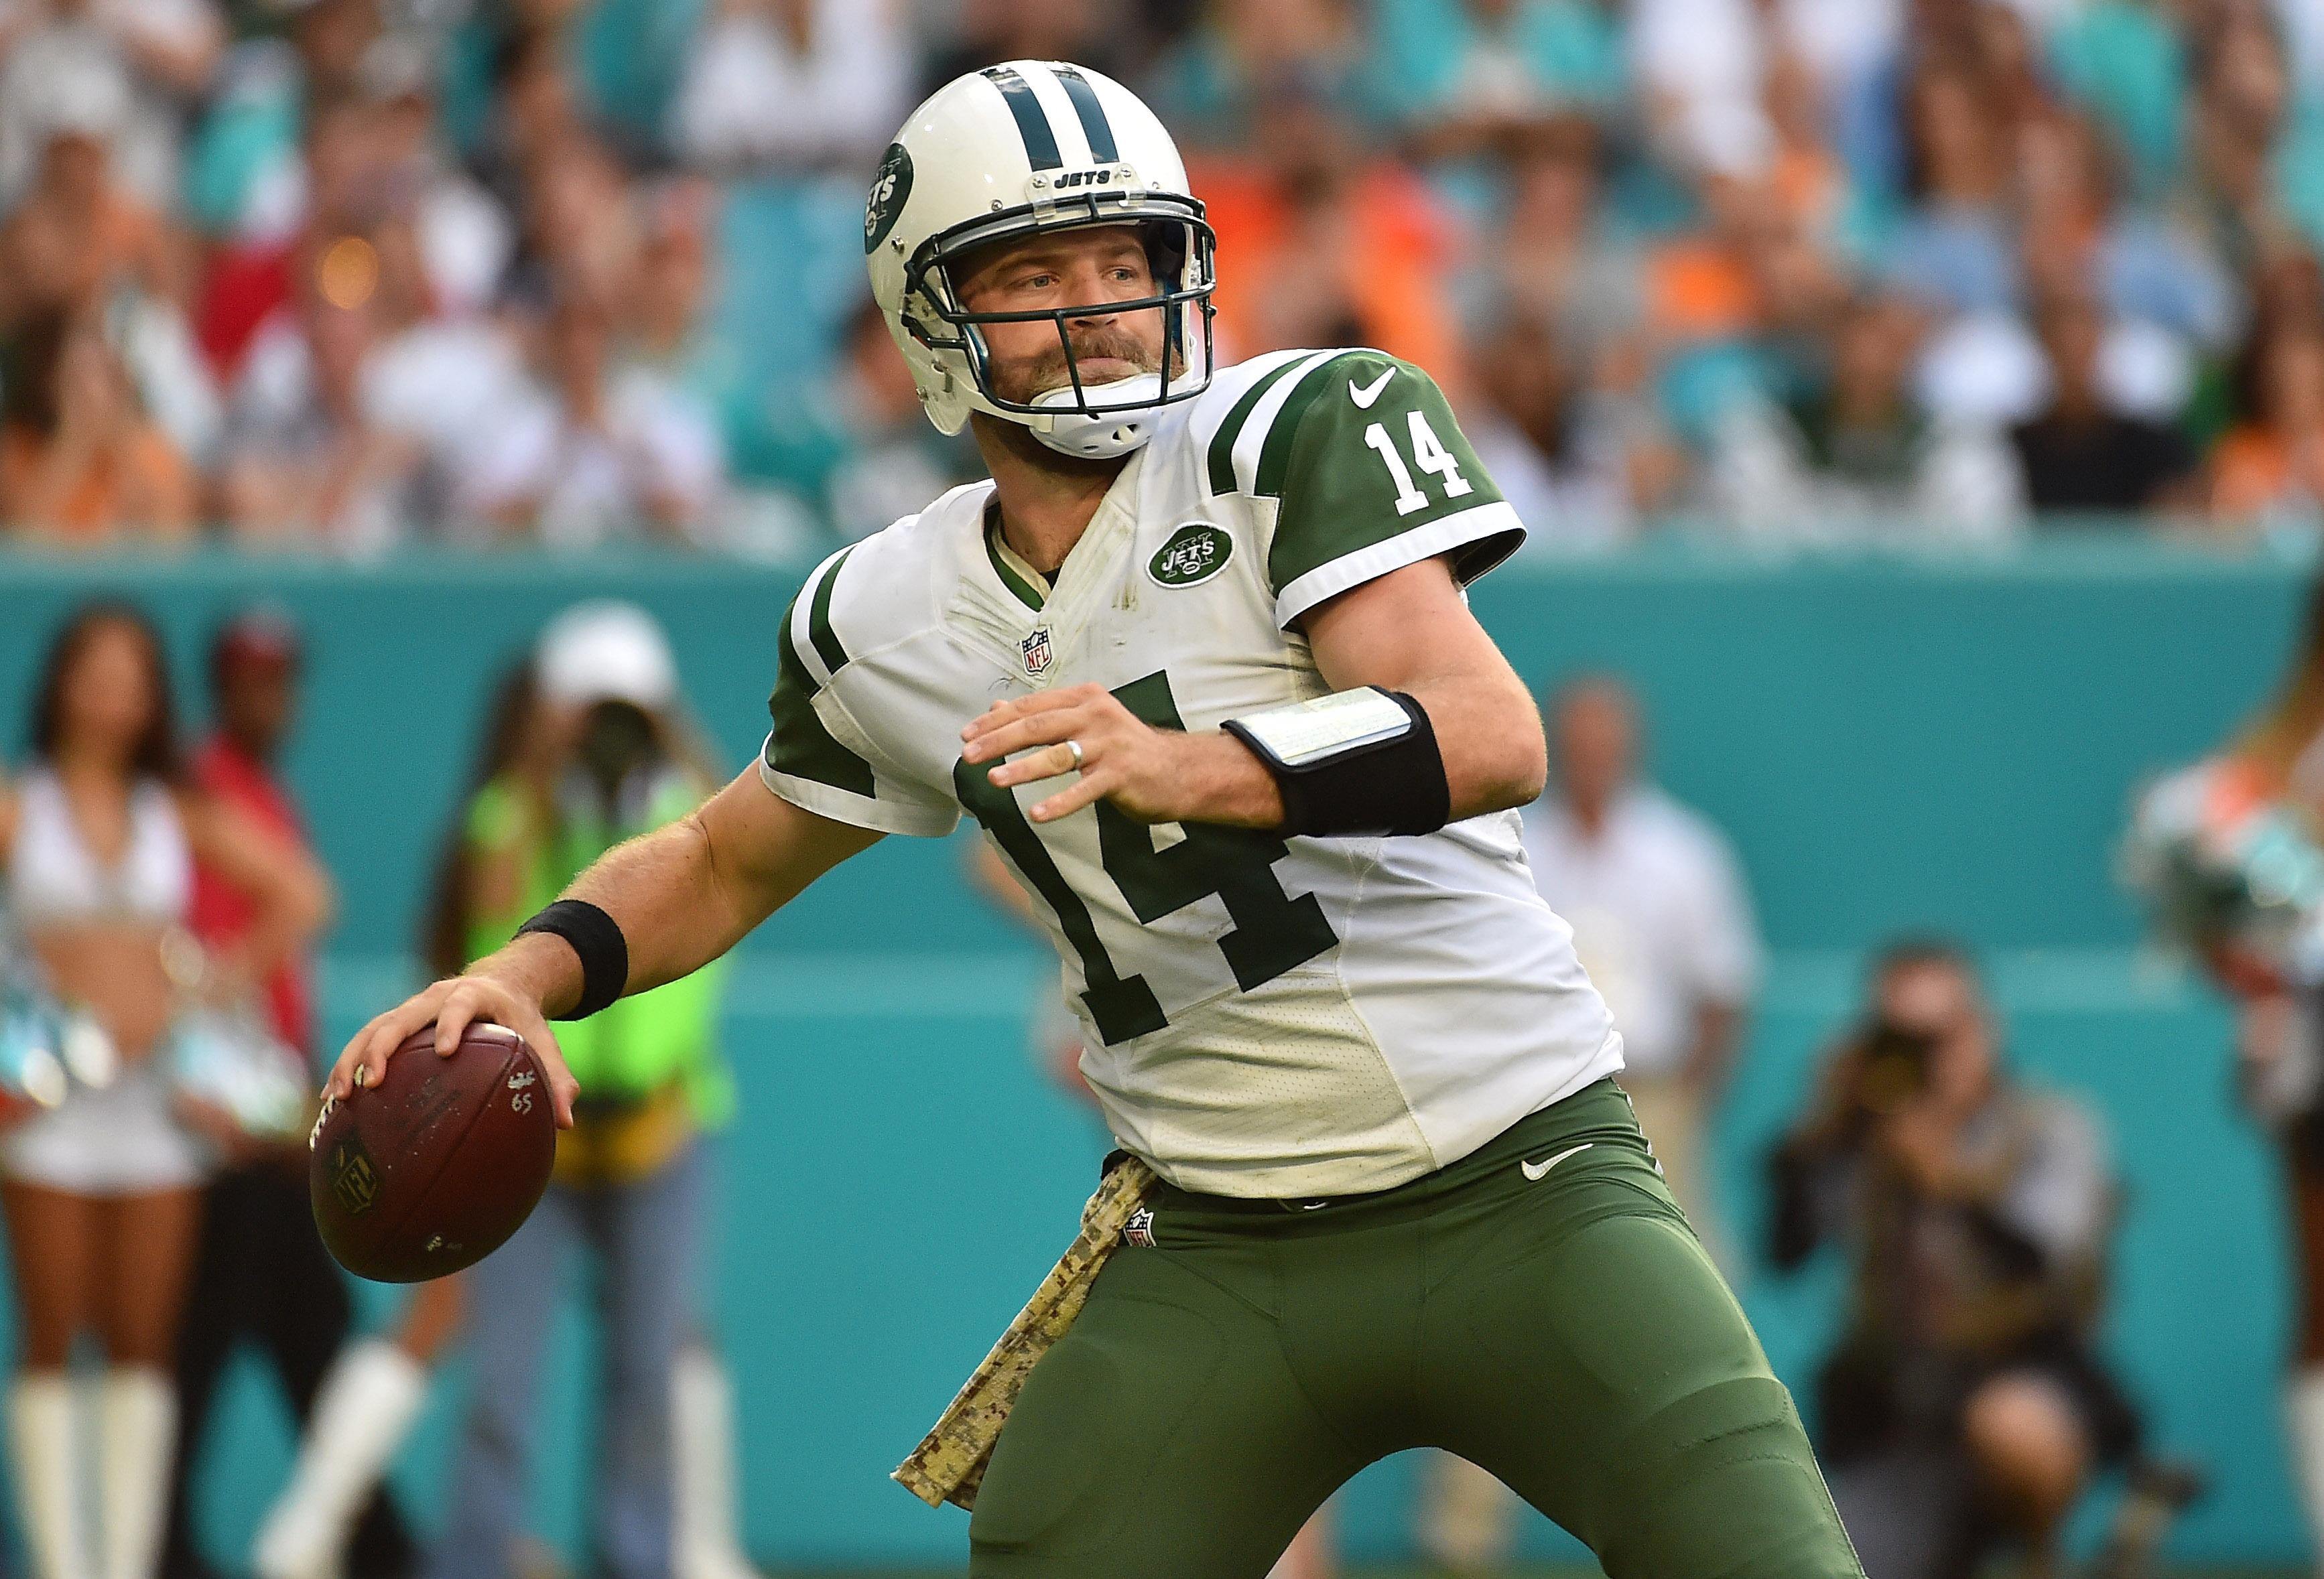 New York Jets: Ryan Fitzpatrick's Game-Time Decision Status Makes No Sense